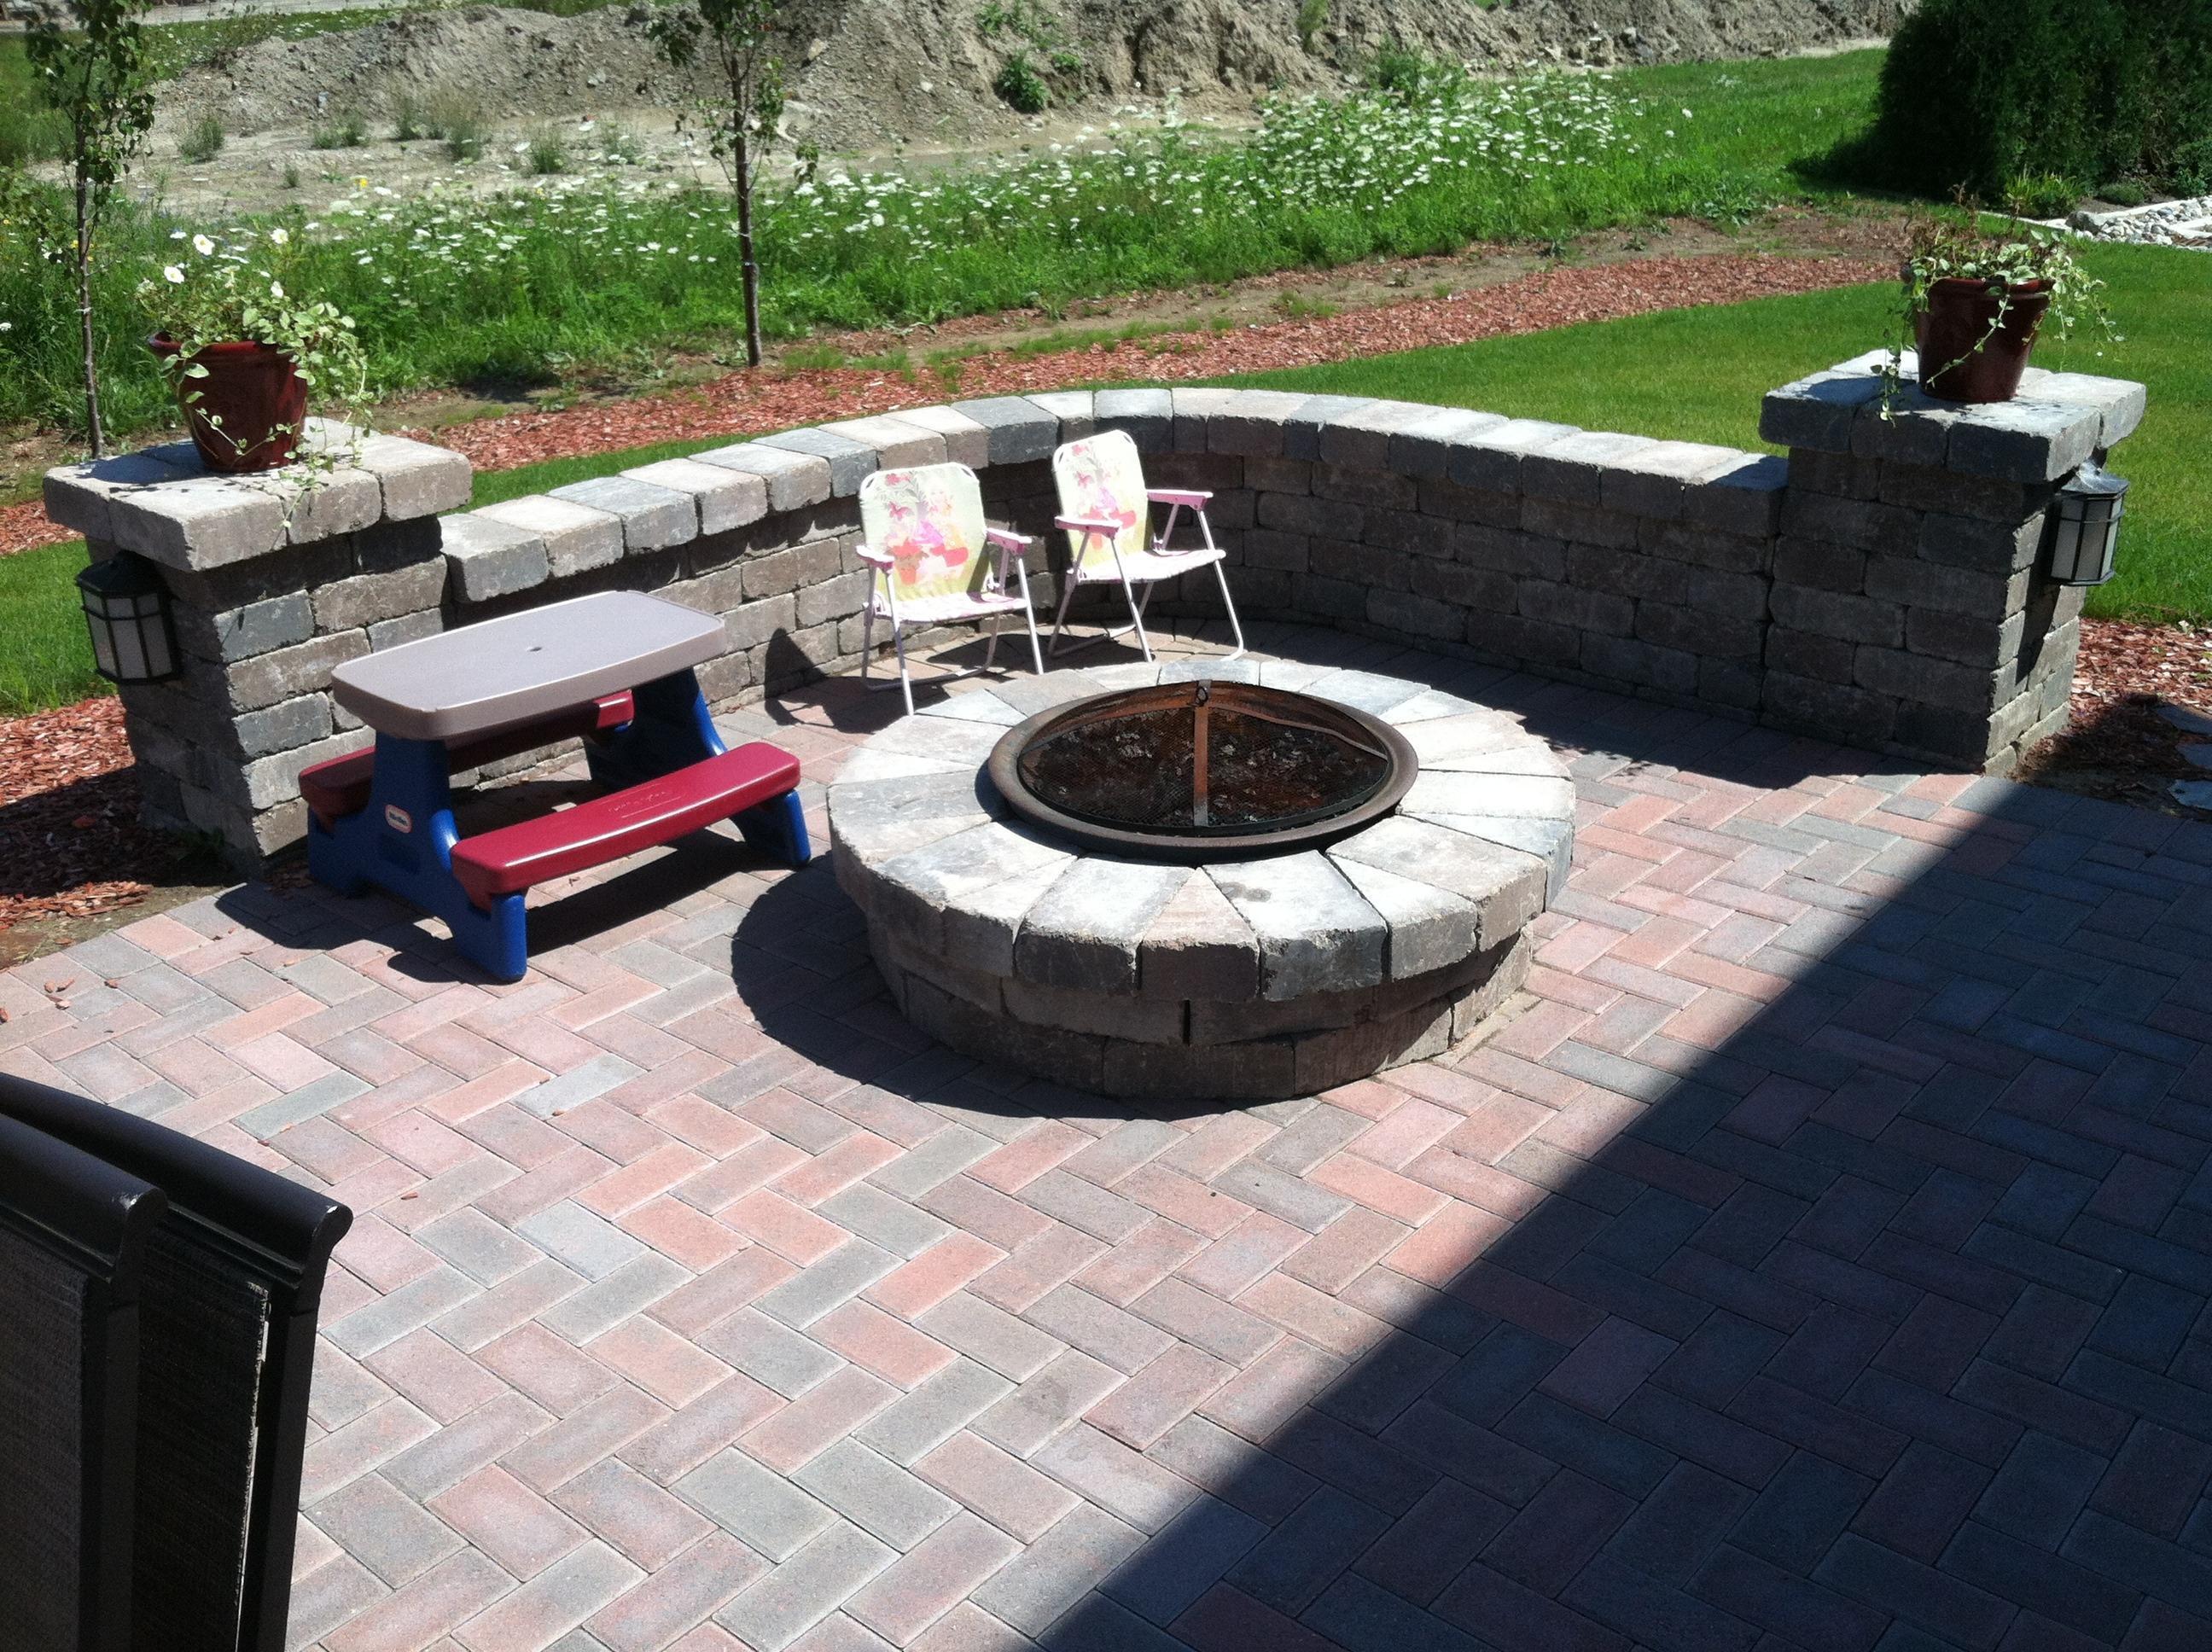 Cornerstone Brick Paving & Landscape image 2